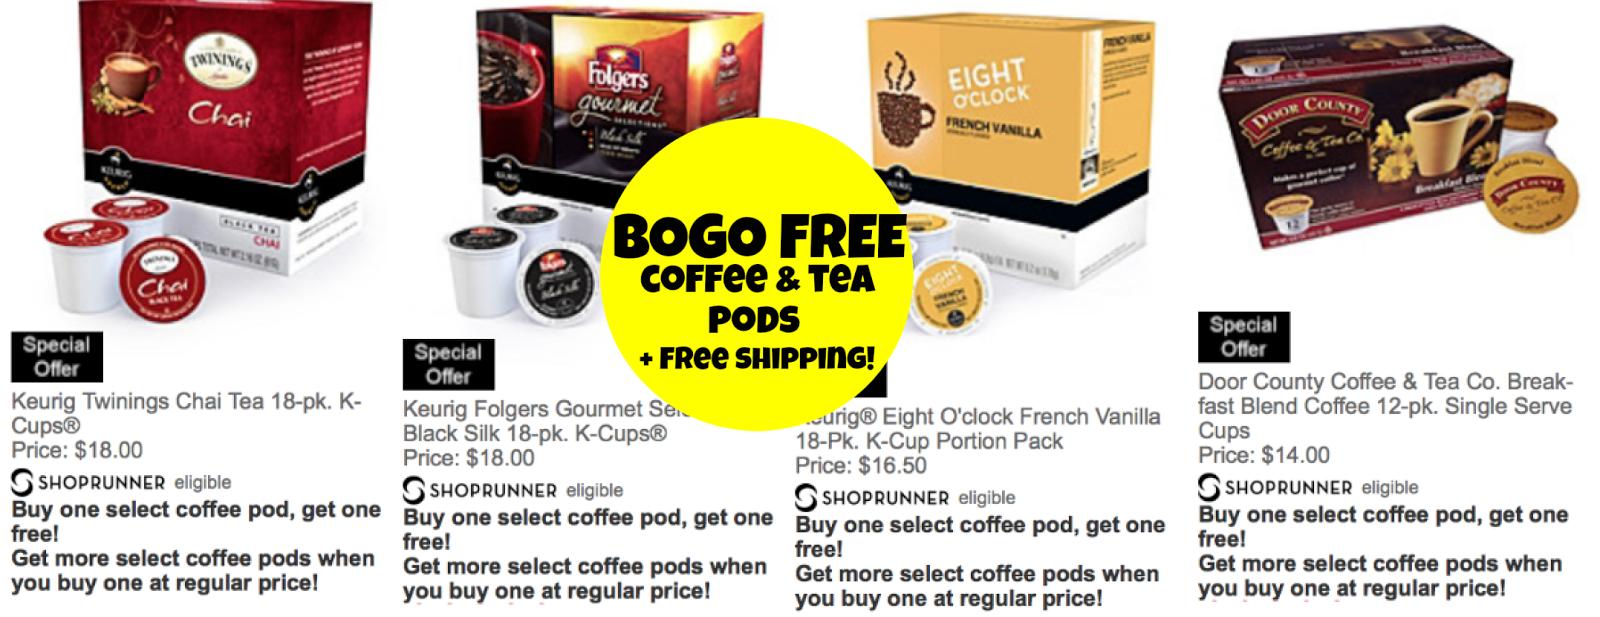 http://www.thebinderladies.com/2014/10/bontoncom-buy-1-get-1-free-coffee-tea-k.html#.VD7sZ0vdtbw